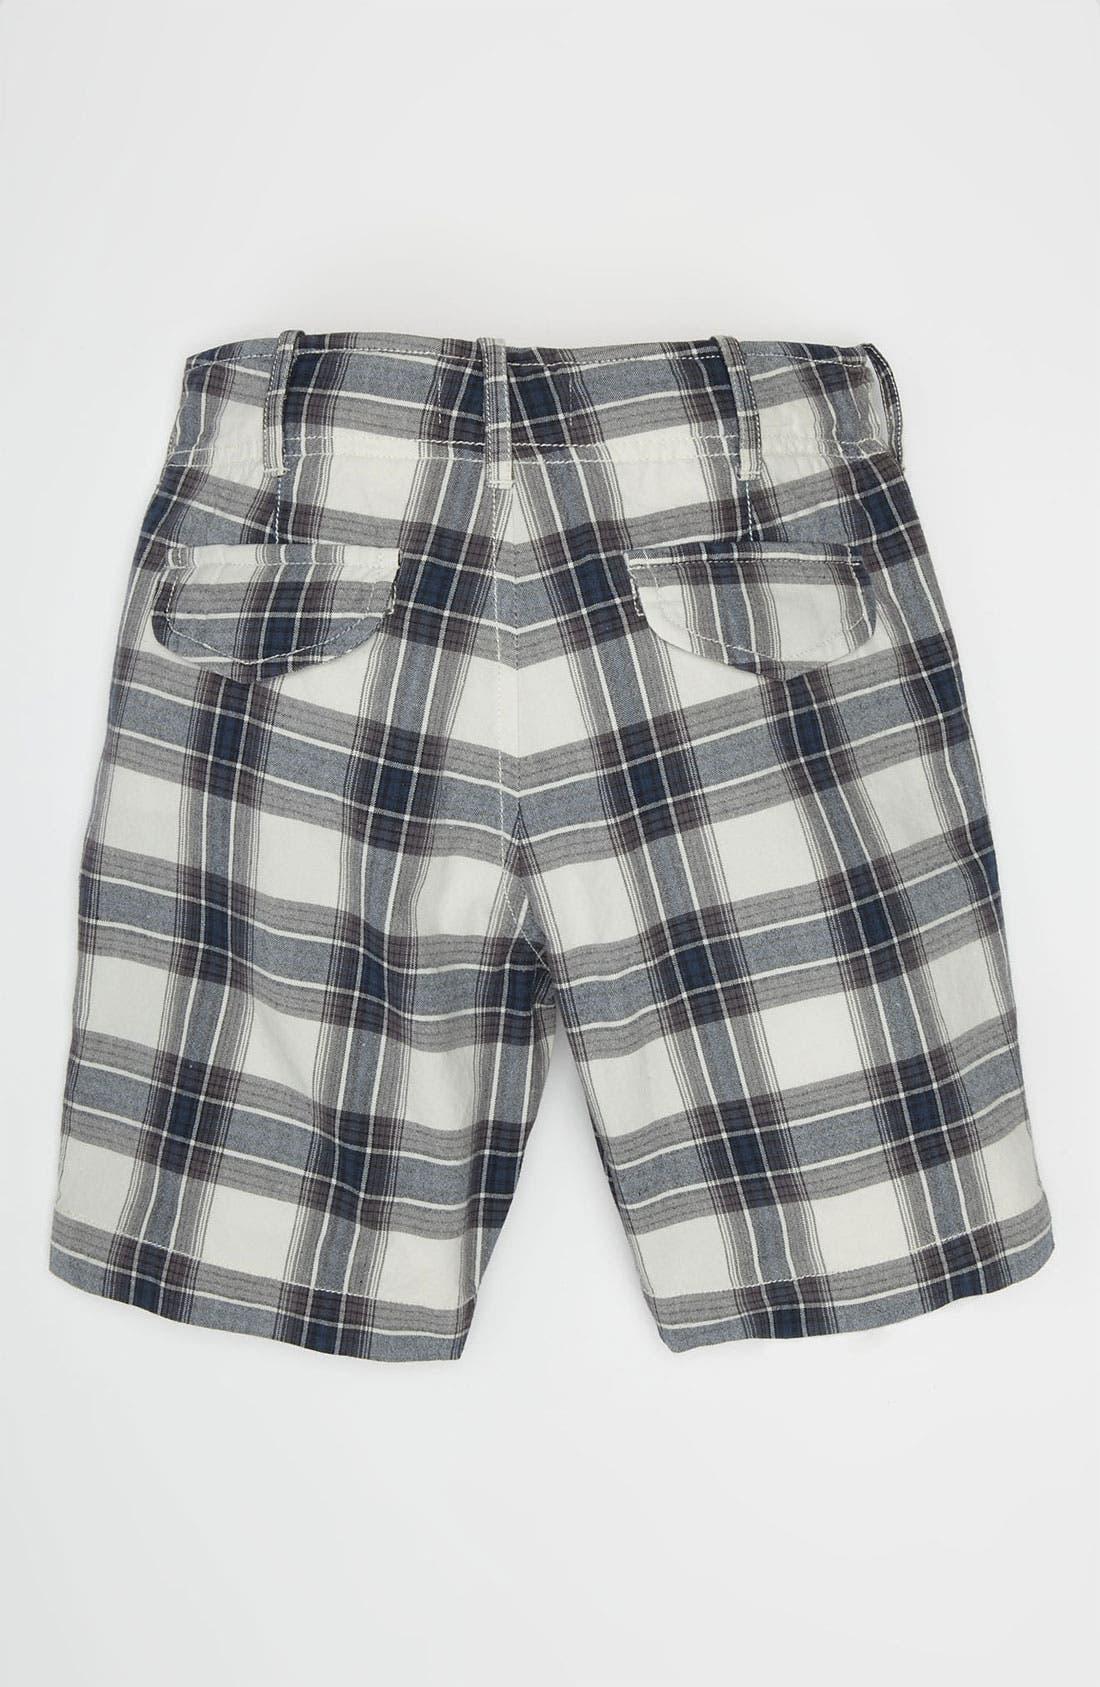 Alternate Image 2  - Peek 'Montauk Hampton' Shorts (Toddler, Little Boys & Big Boys)